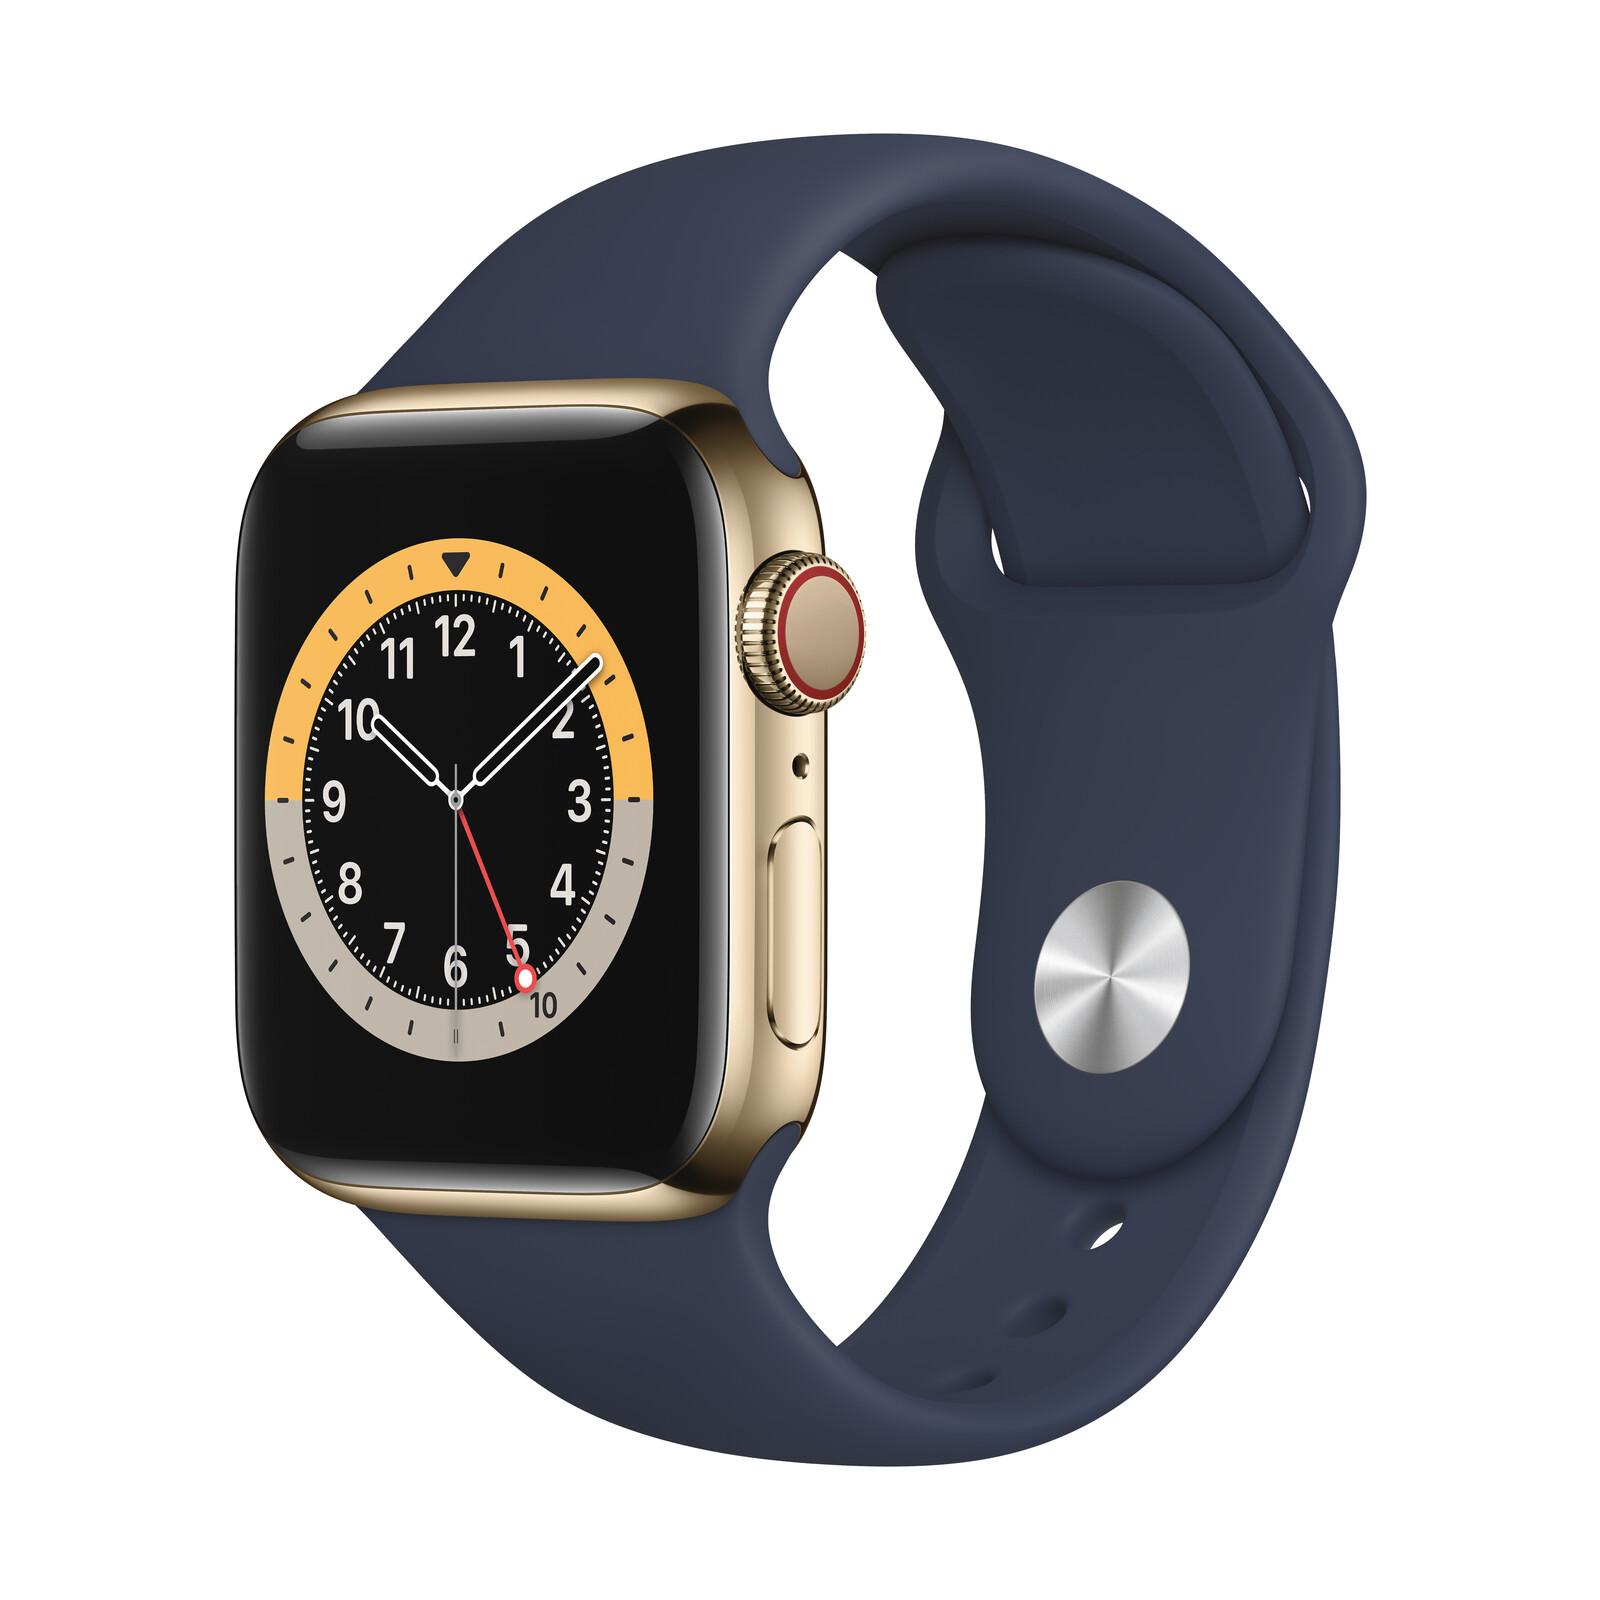 Apple Watch S6 GPS+Cellular Edelstahl gold 40mm dunkelmarine